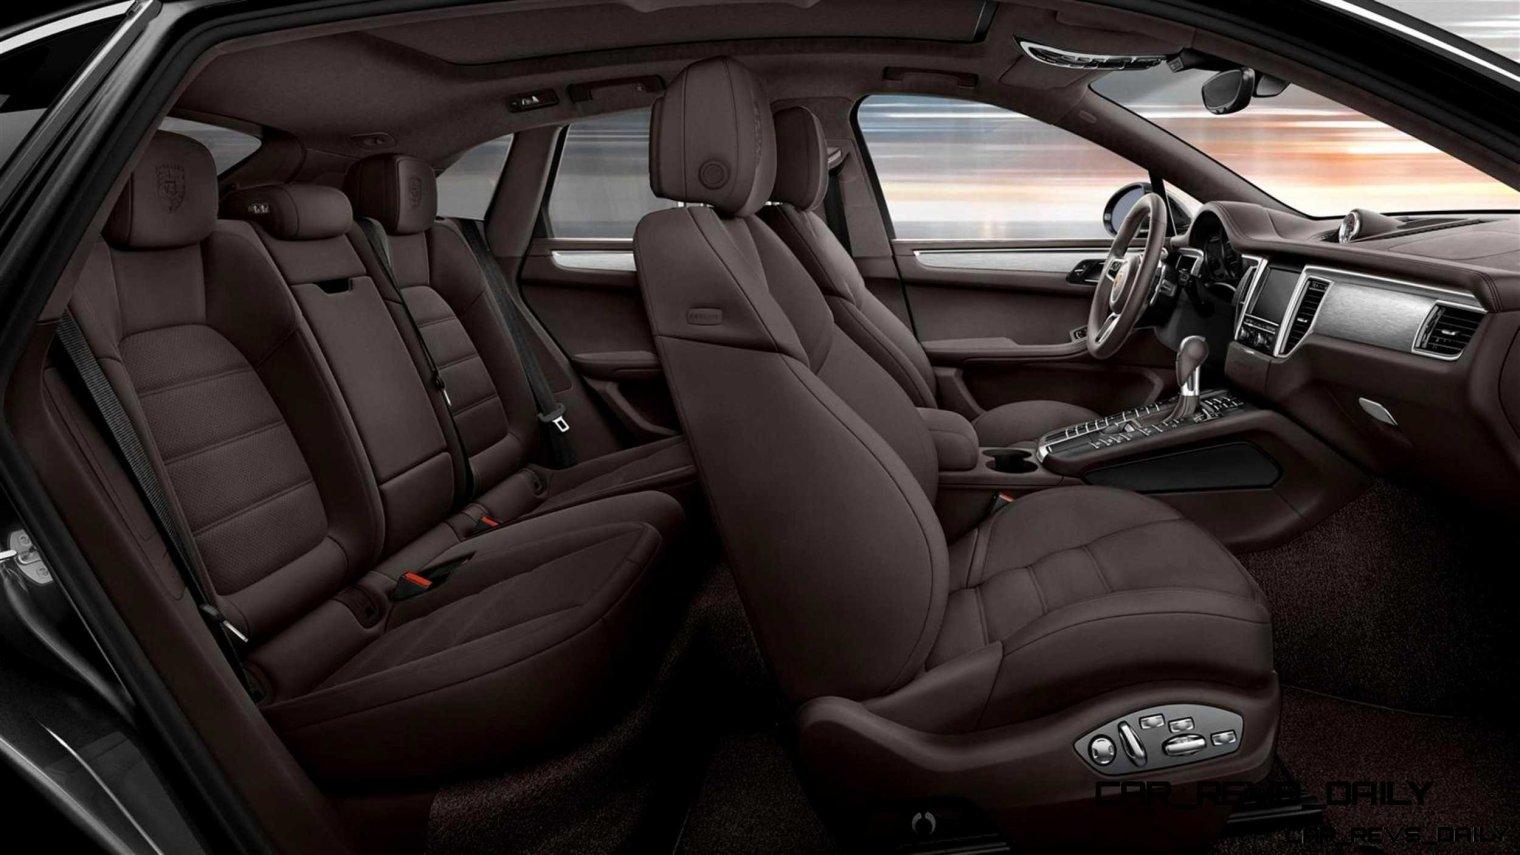 2015 Porsche Macan - Latest Images - CarRevsDaily.com 6